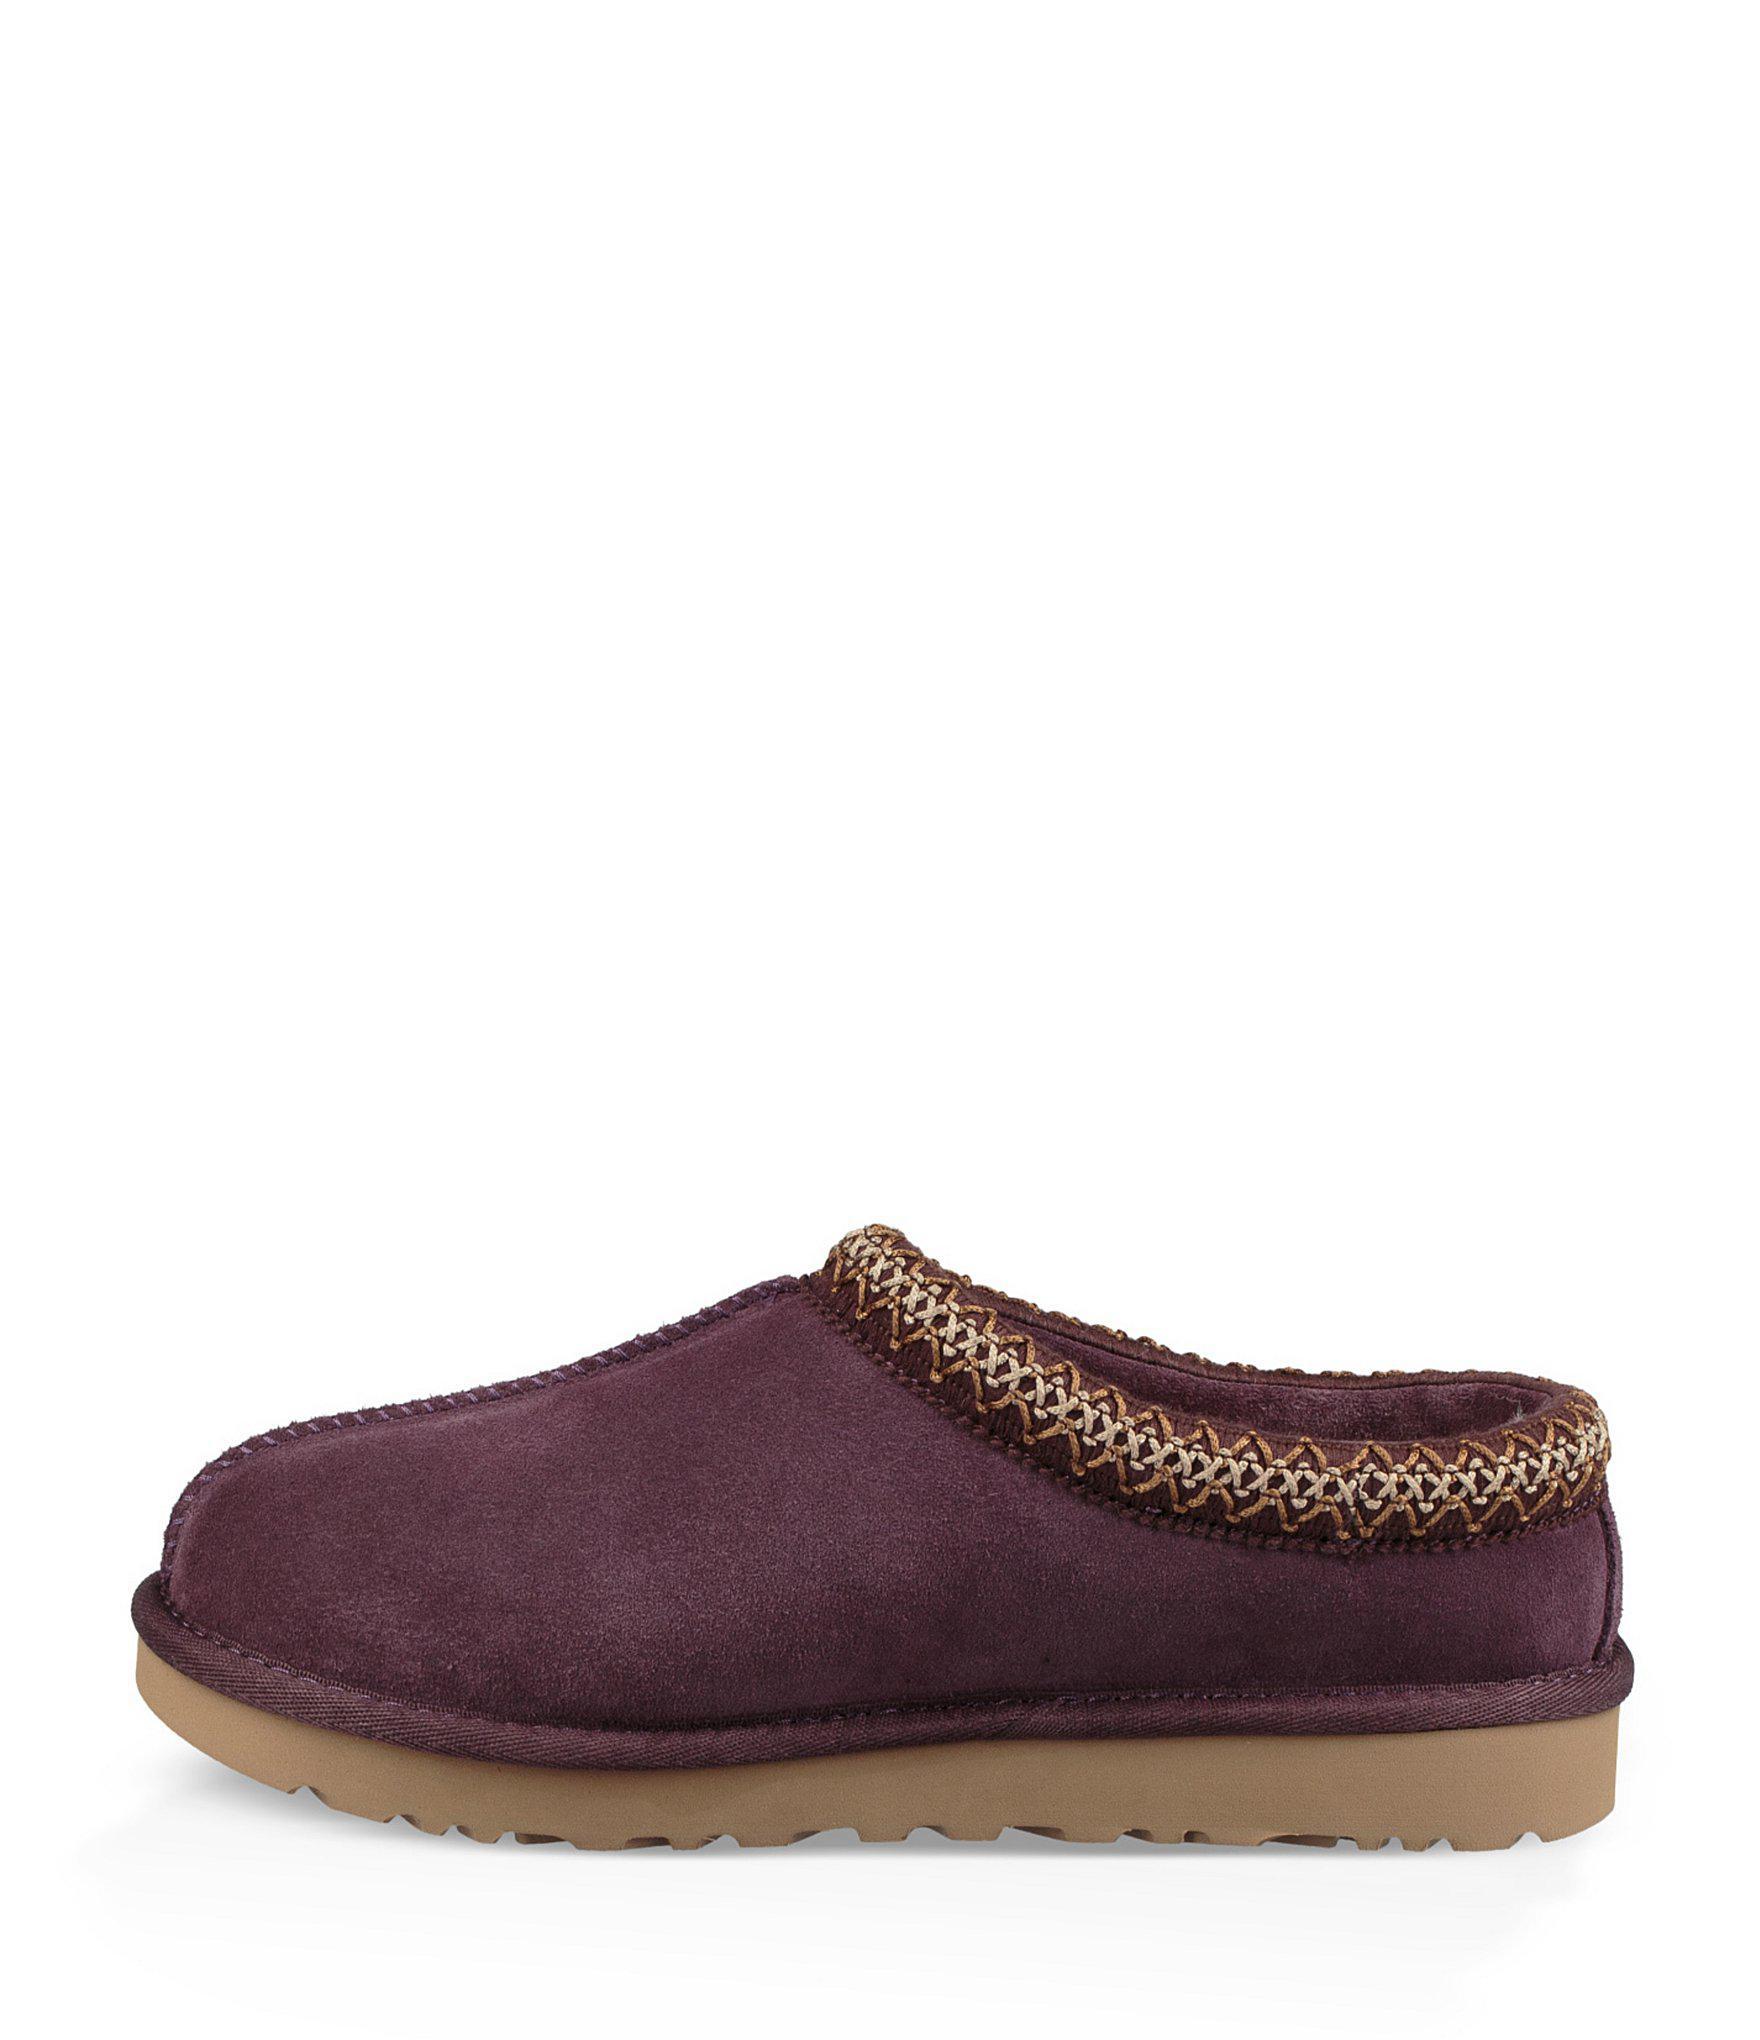 fe4686d8f280 Lyst - UGG Women s Tasman Slippers